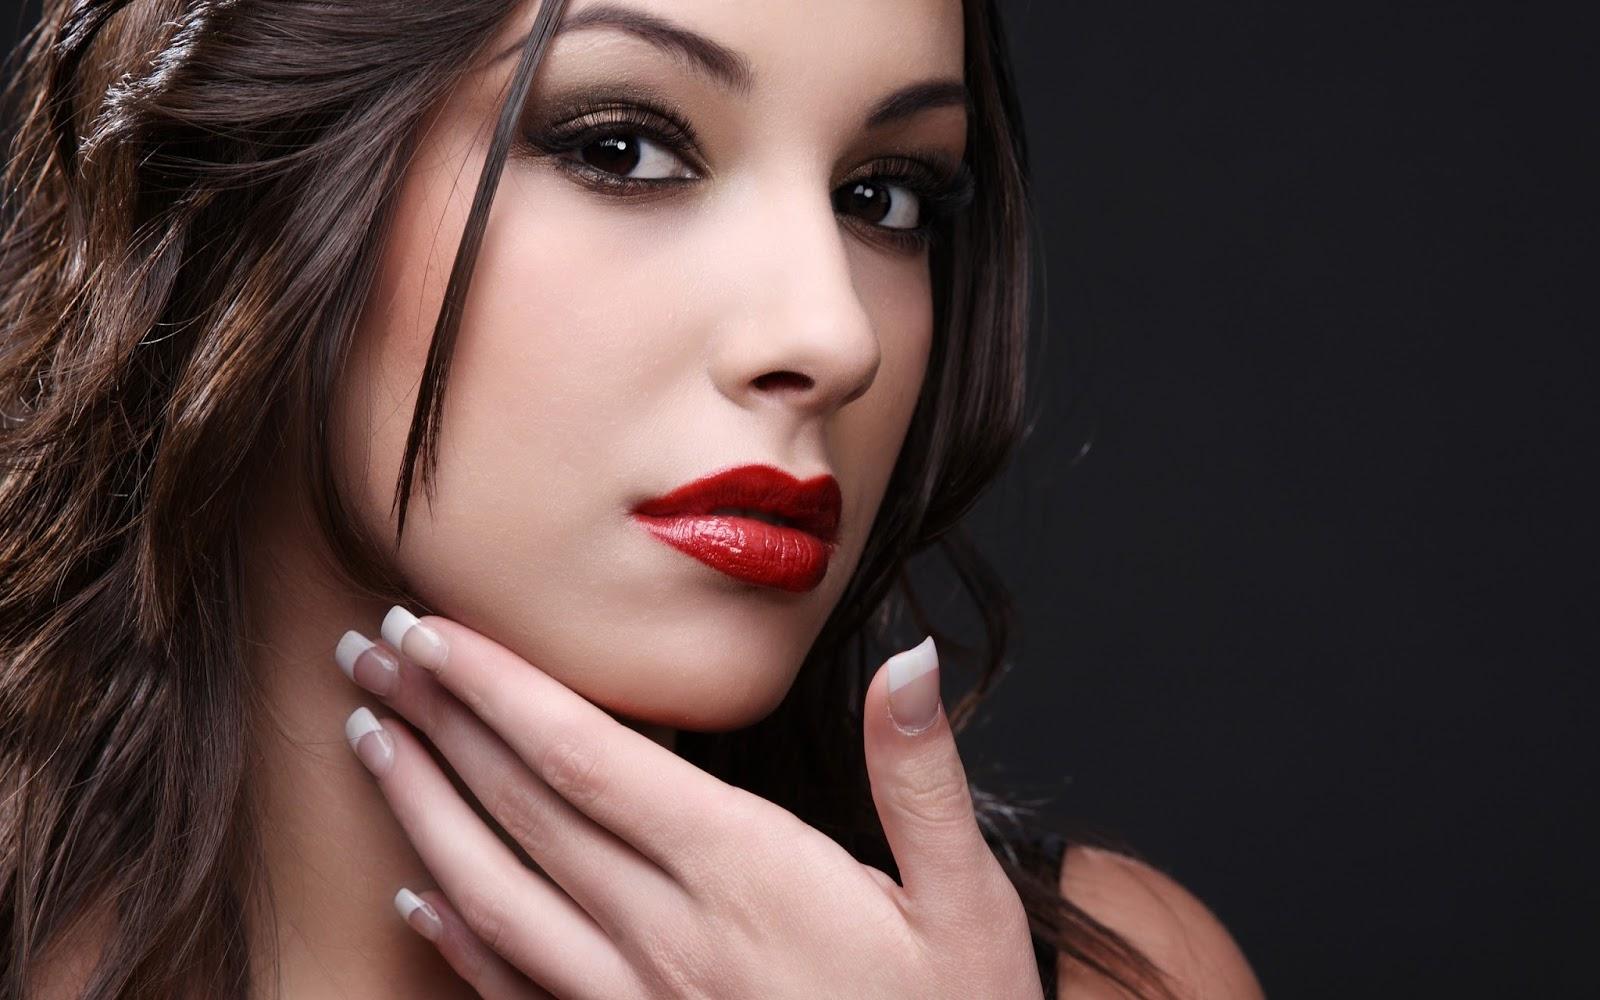 Model with beautiful Lips Wallpaper